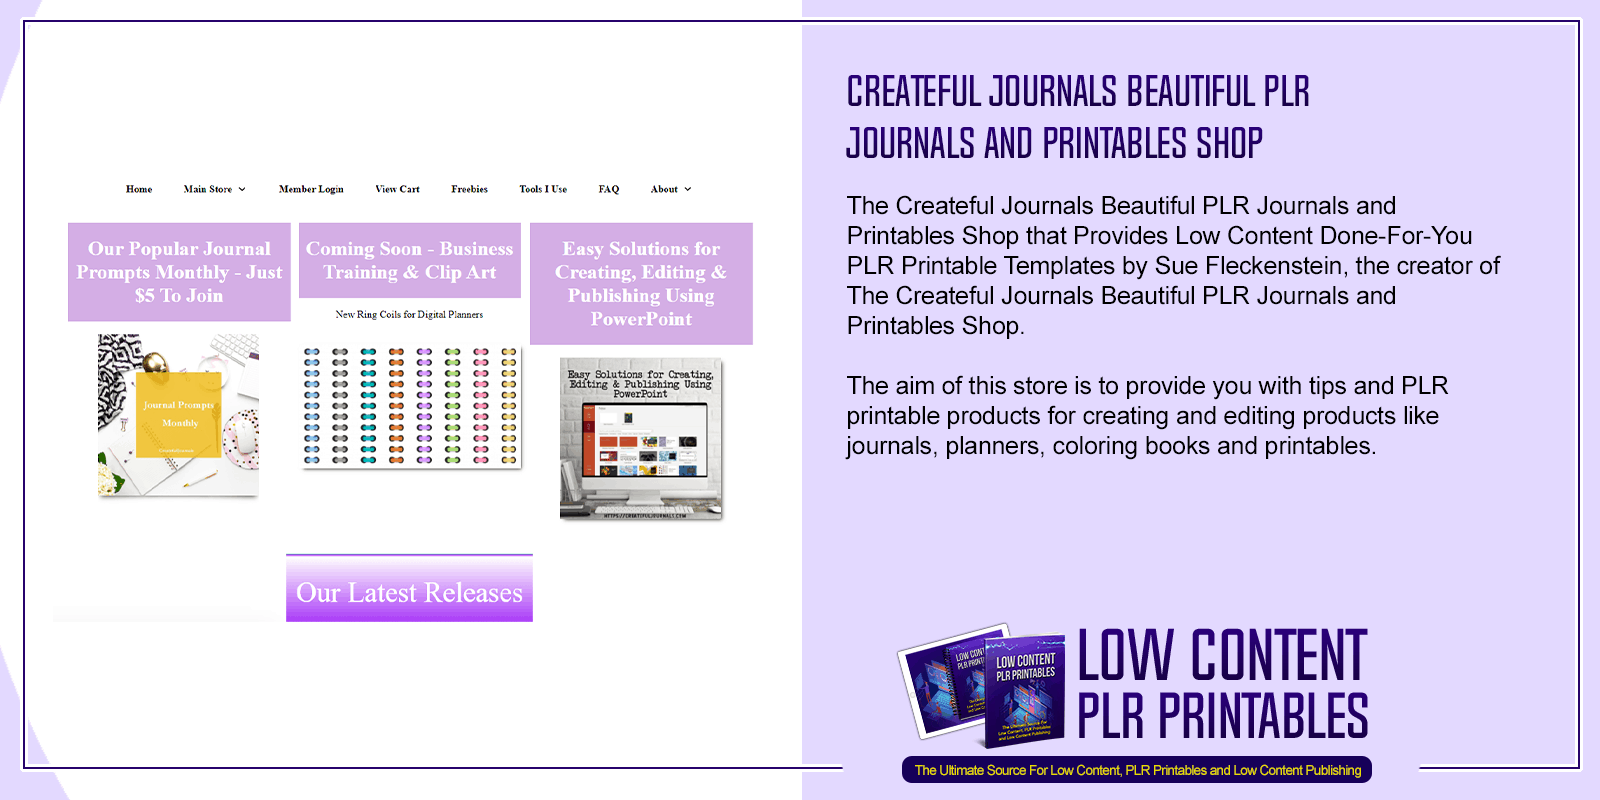 Createful Journals Beautiful PLR Journals and Printables Shop